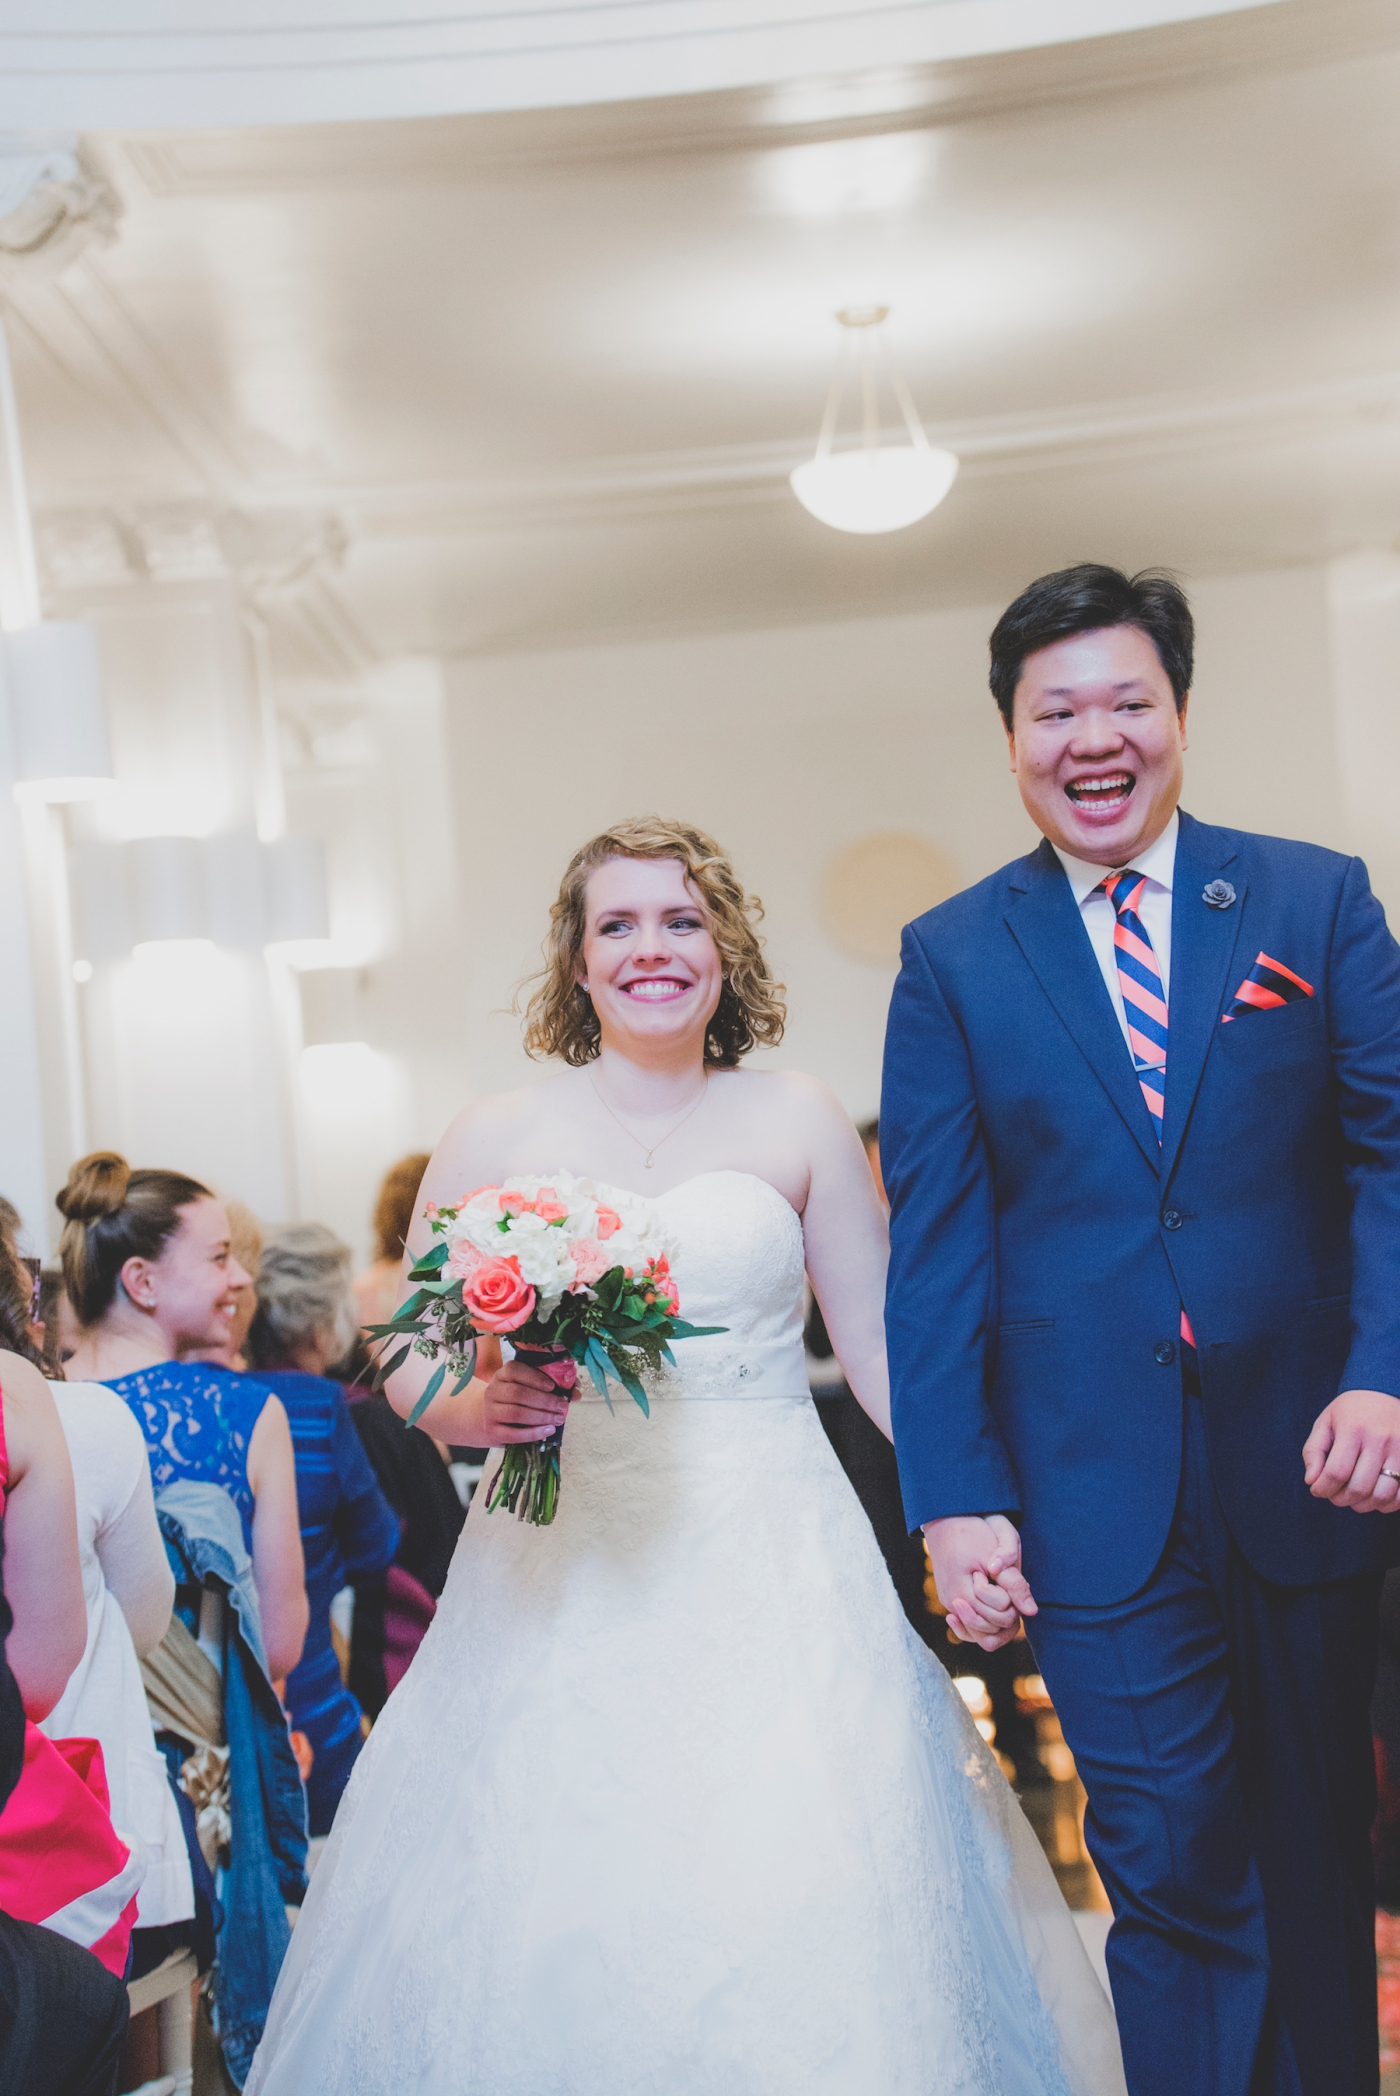 DSC_2735Everett_Wedding_Ballroom_Jane_Speleers_photography_Rachel_and_Edmund_Ceremony_2017